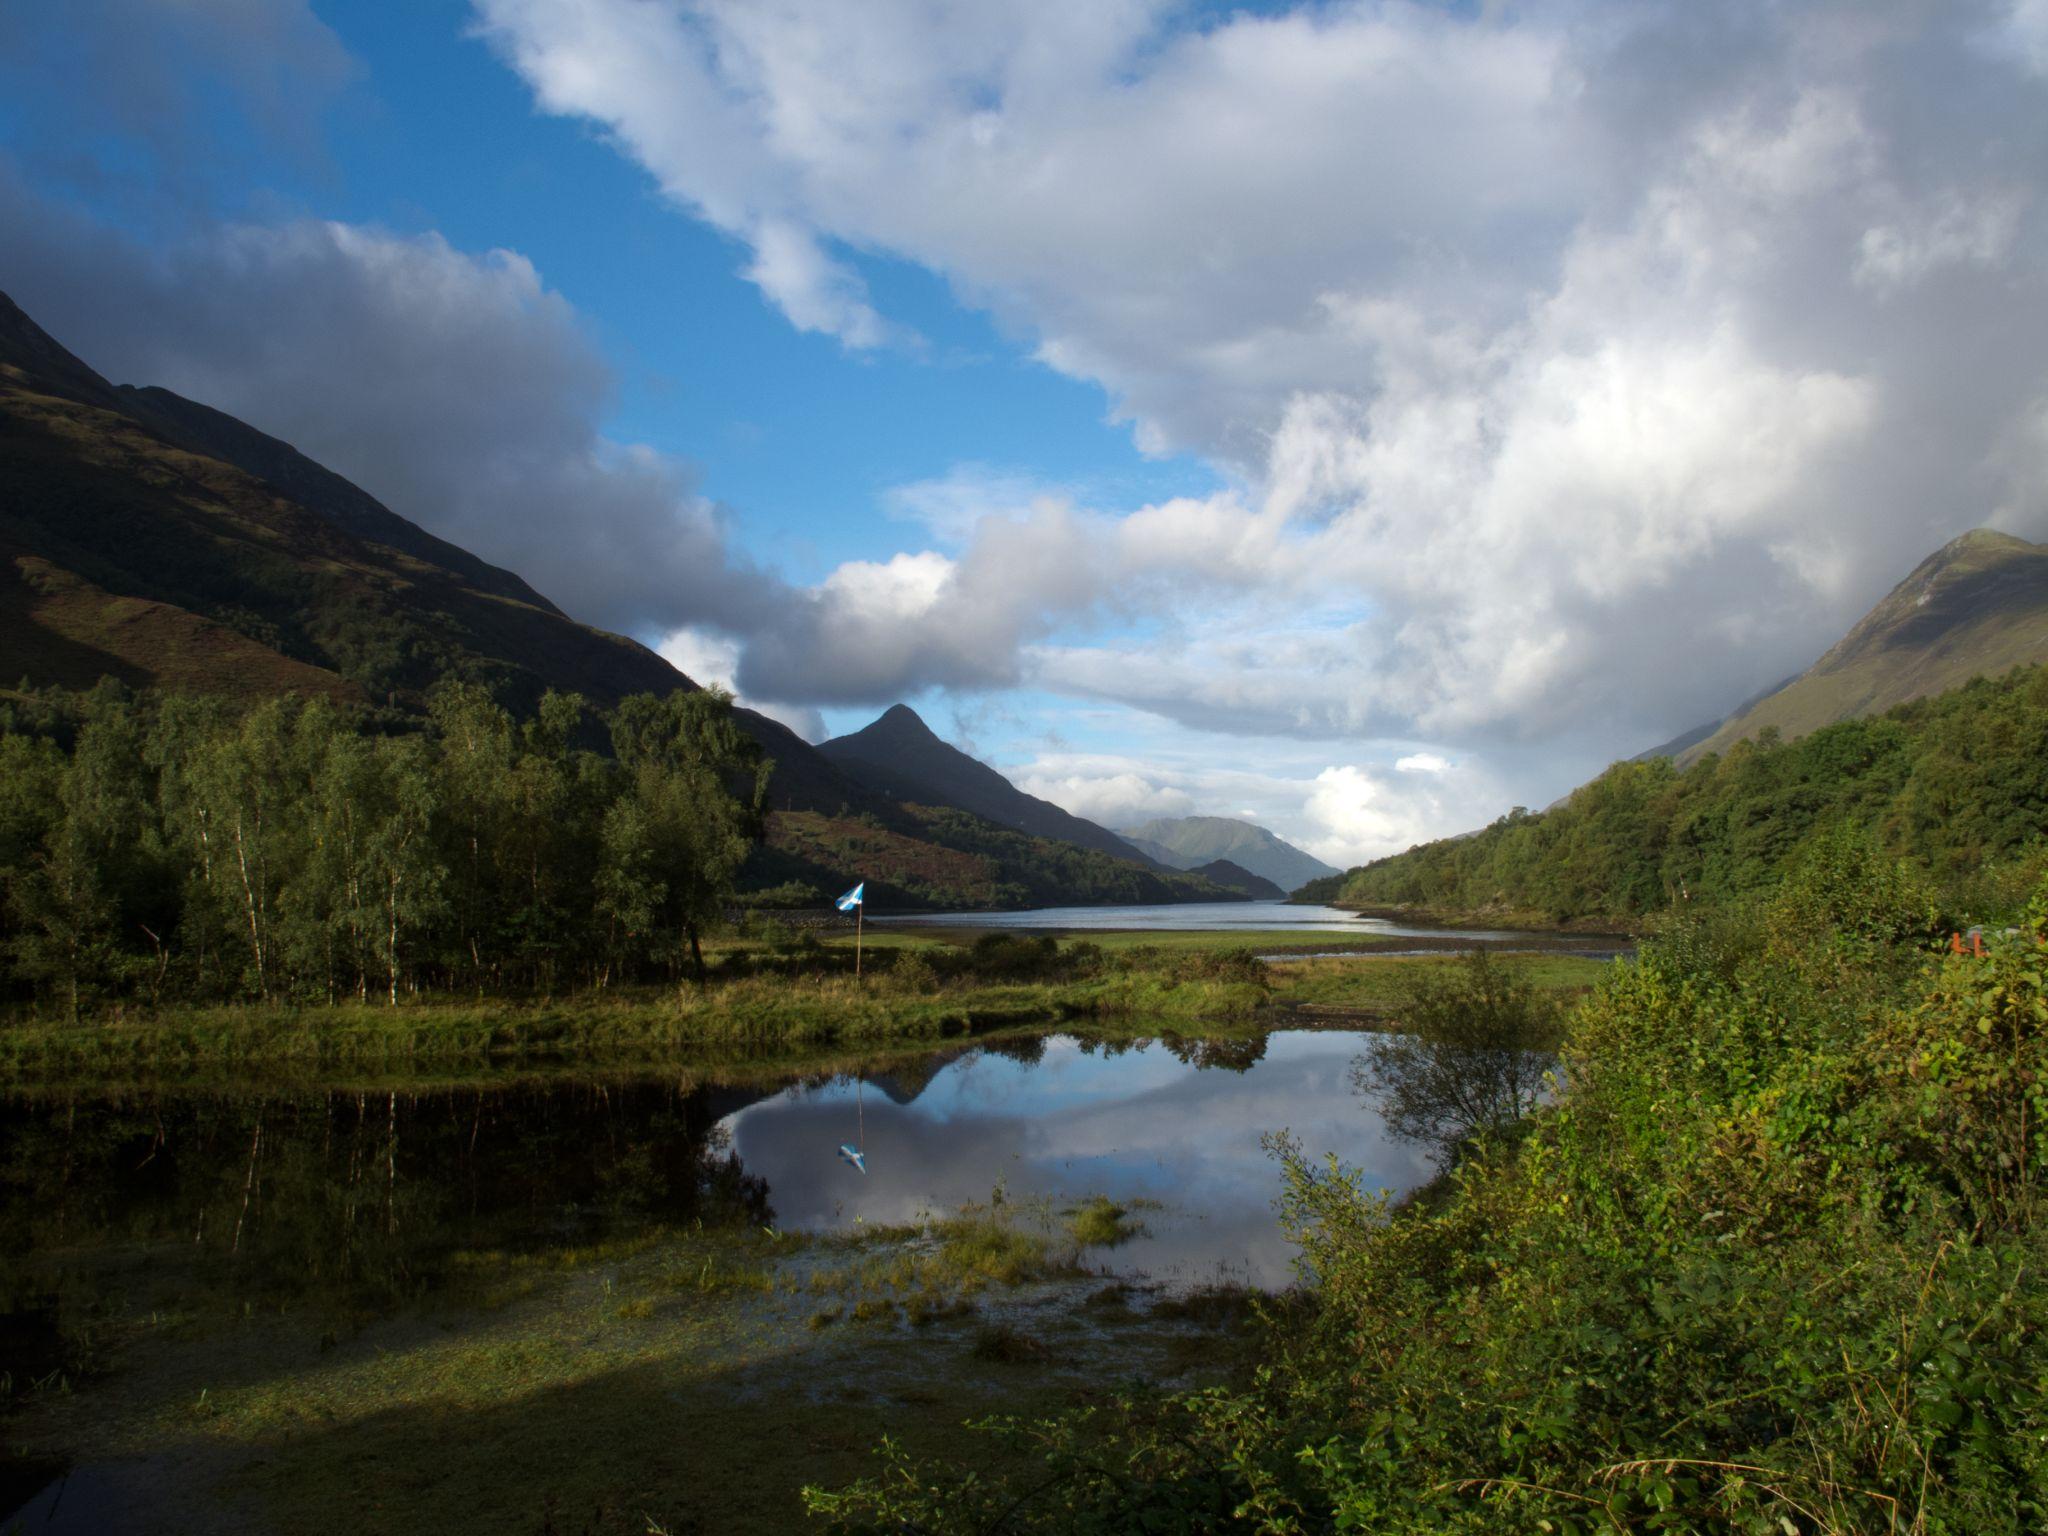 Loch Leven view, United Kingdom